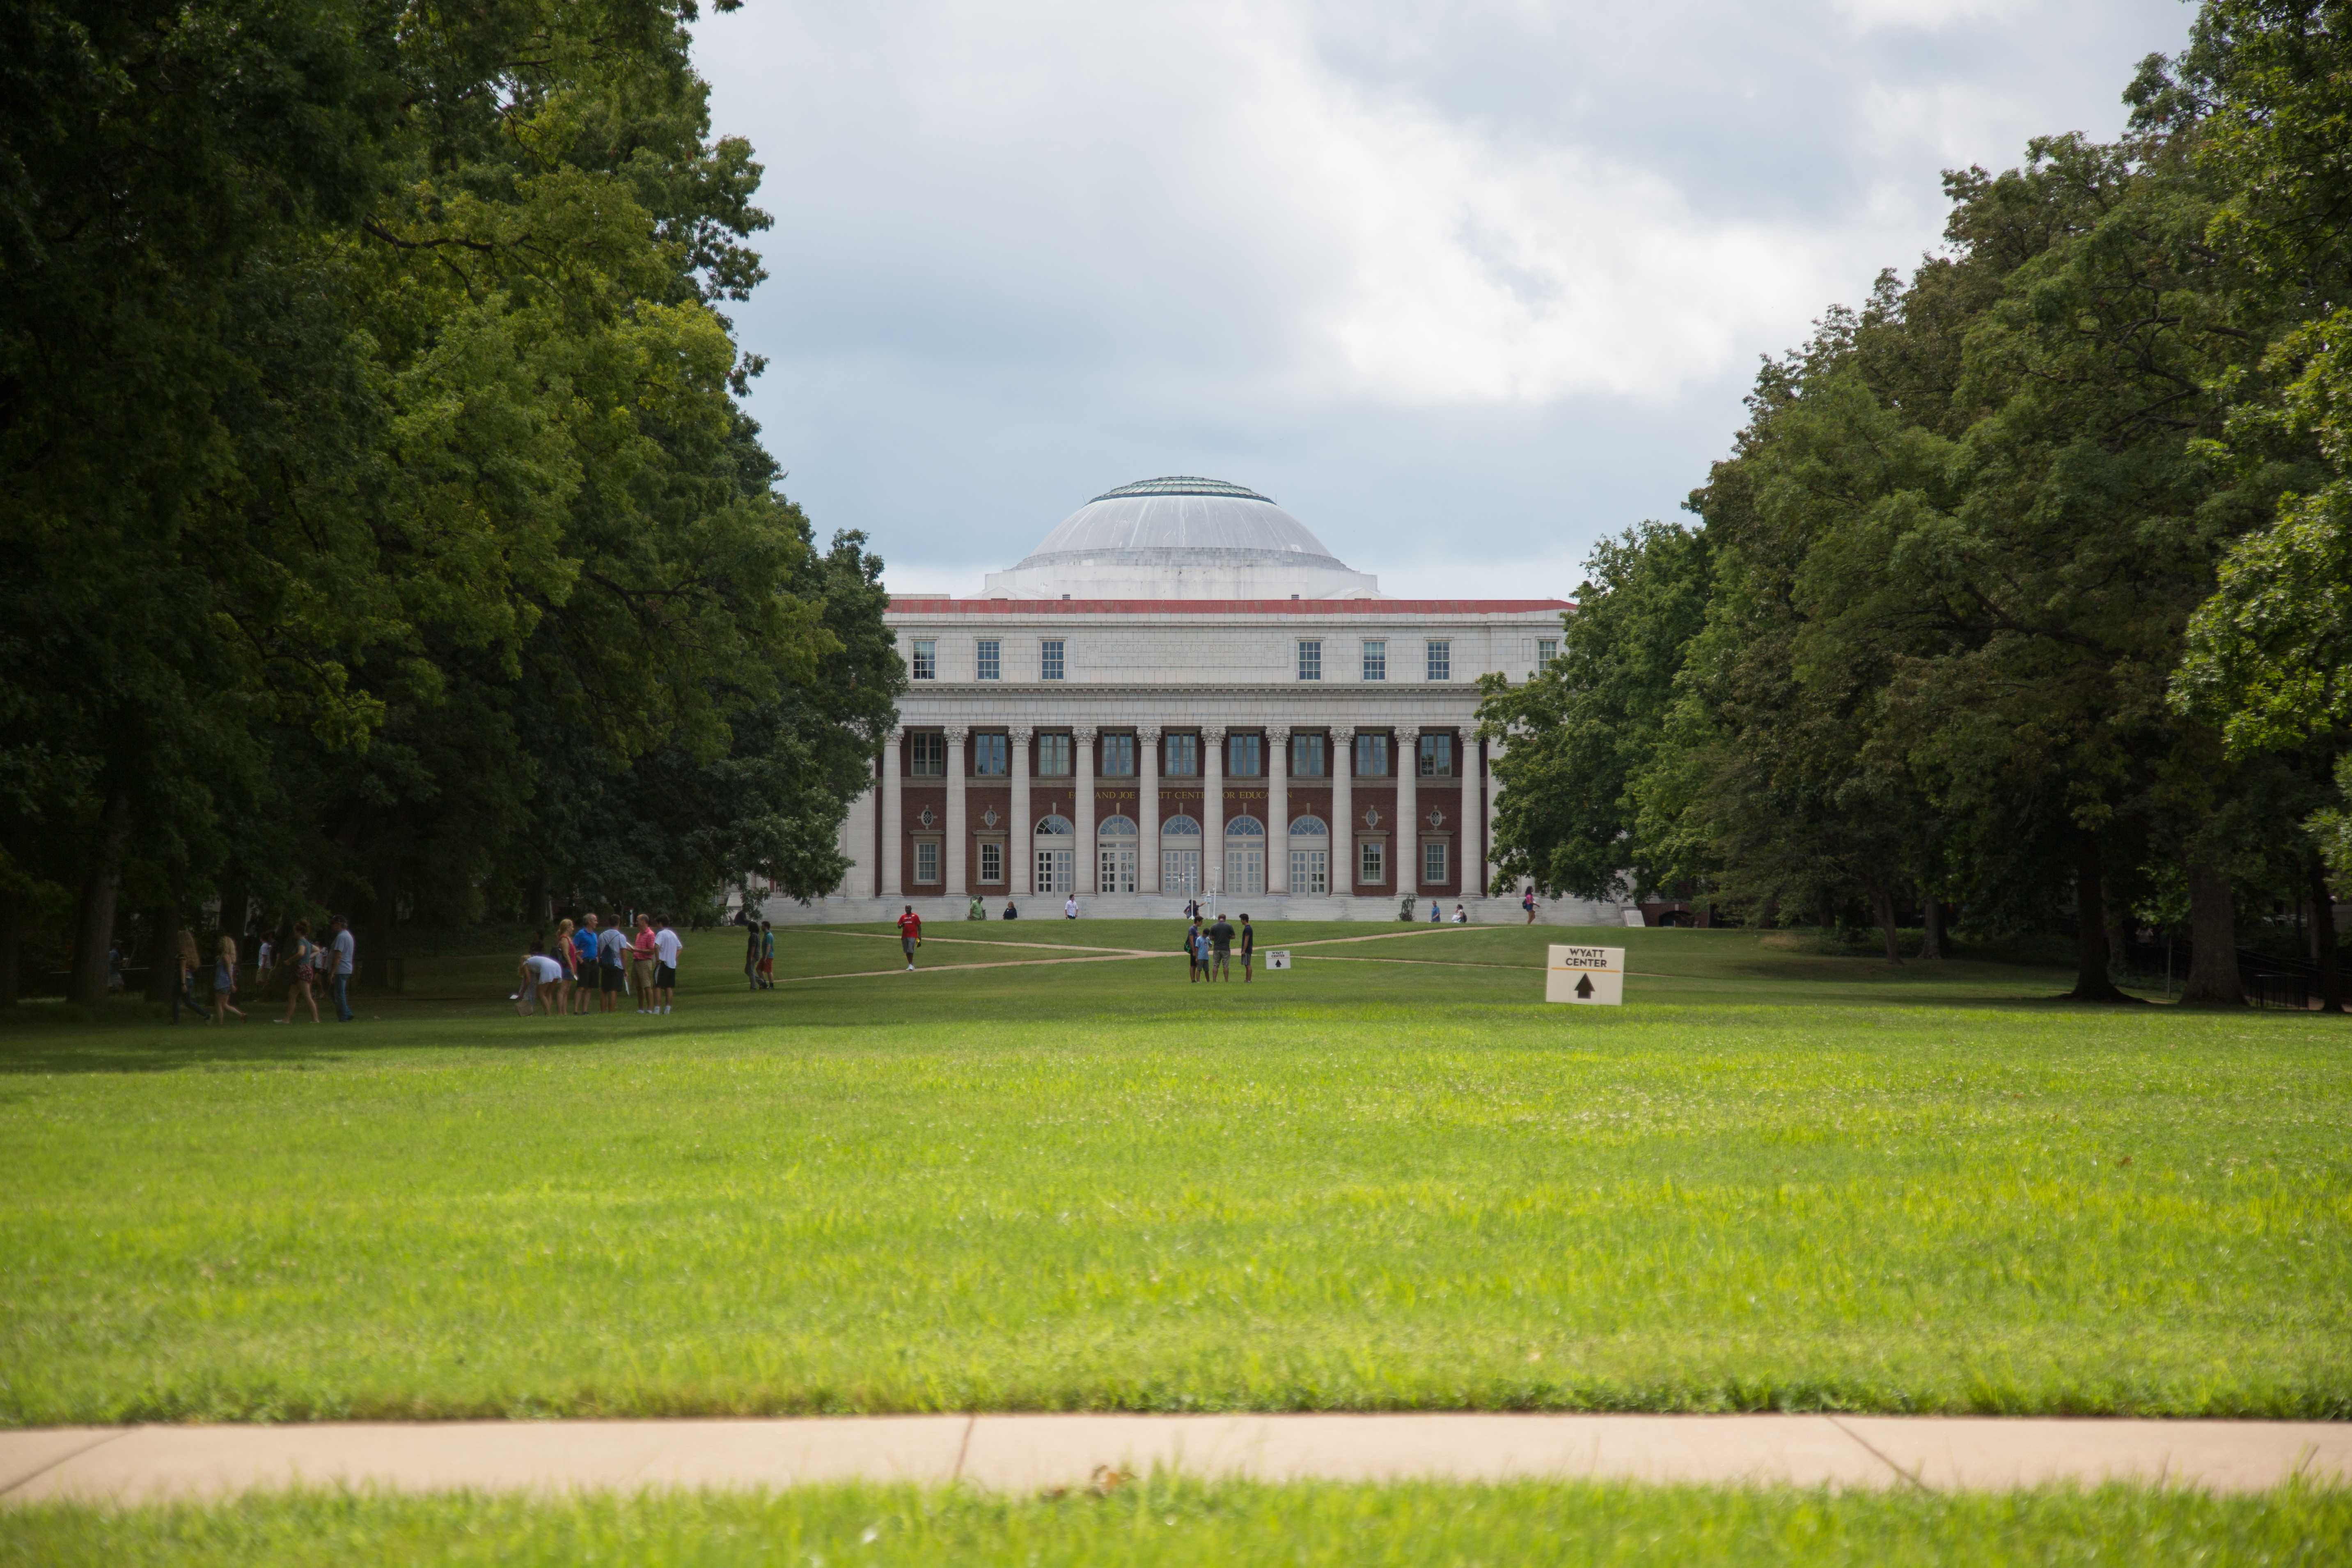 Vanderbilt on Saturday, August 18, 2018. (Photo by Claire Barnett)